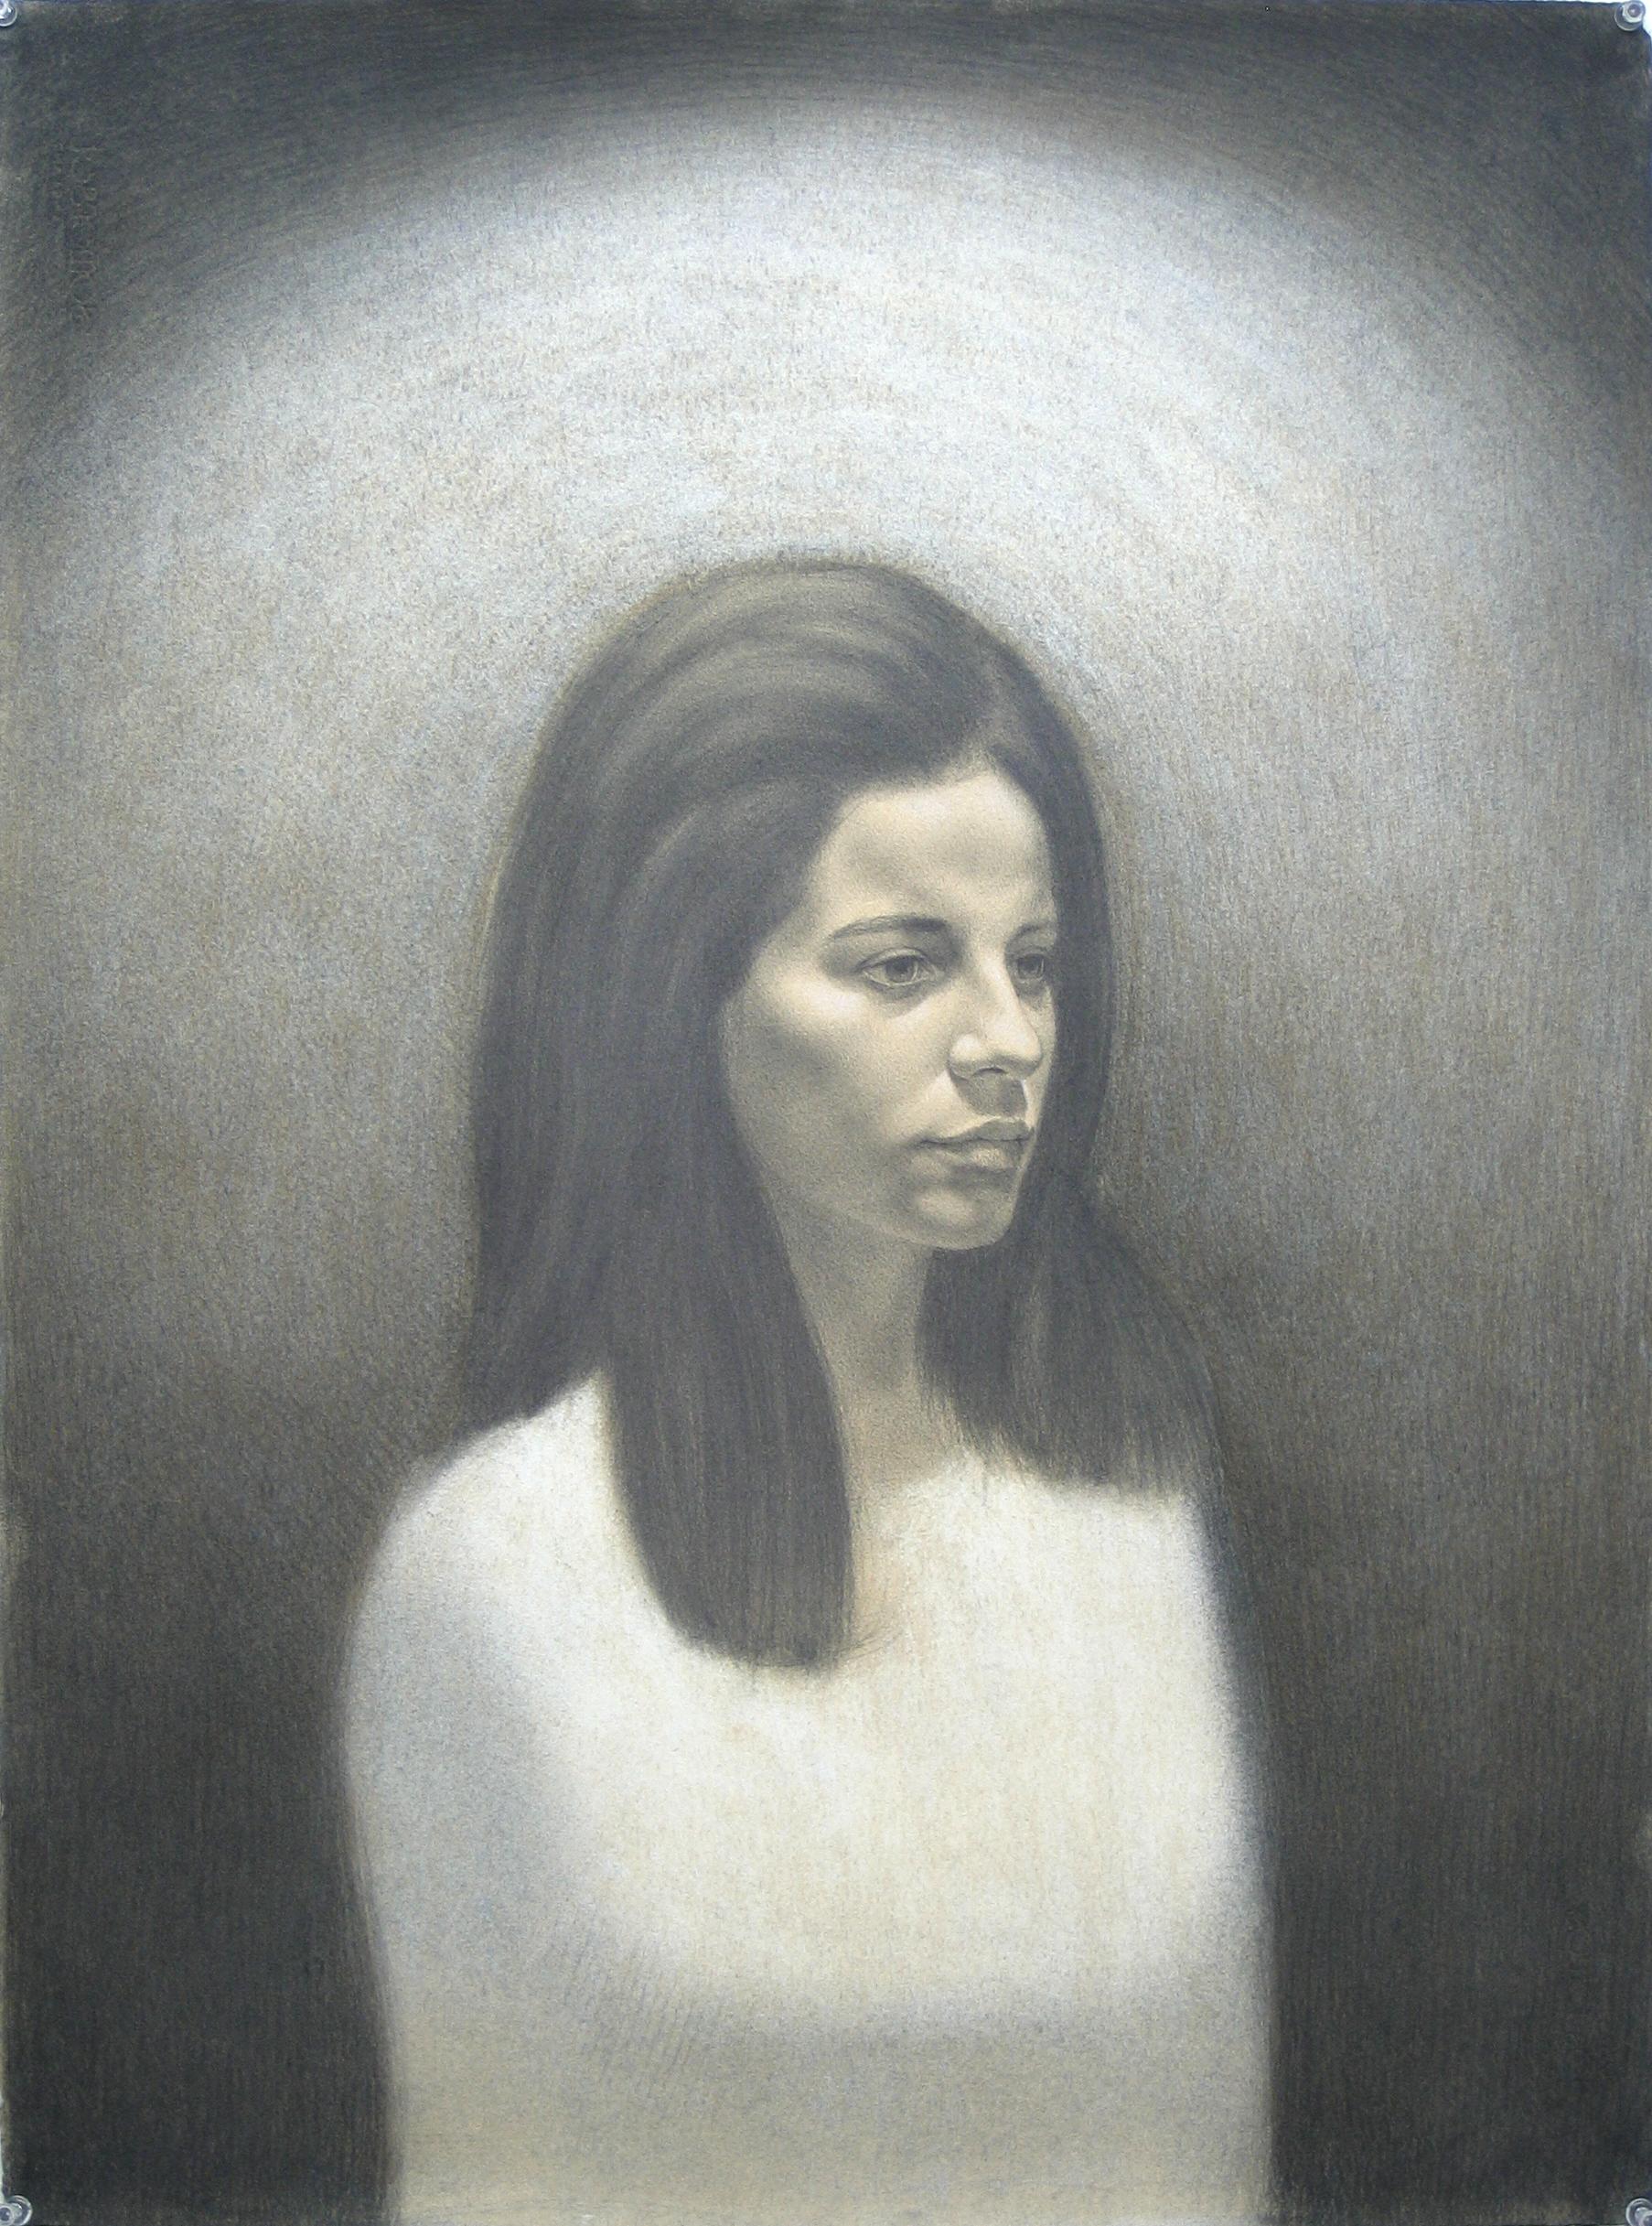 Alexa artwork by Raphael Sassi - art listed for sale on Artplode